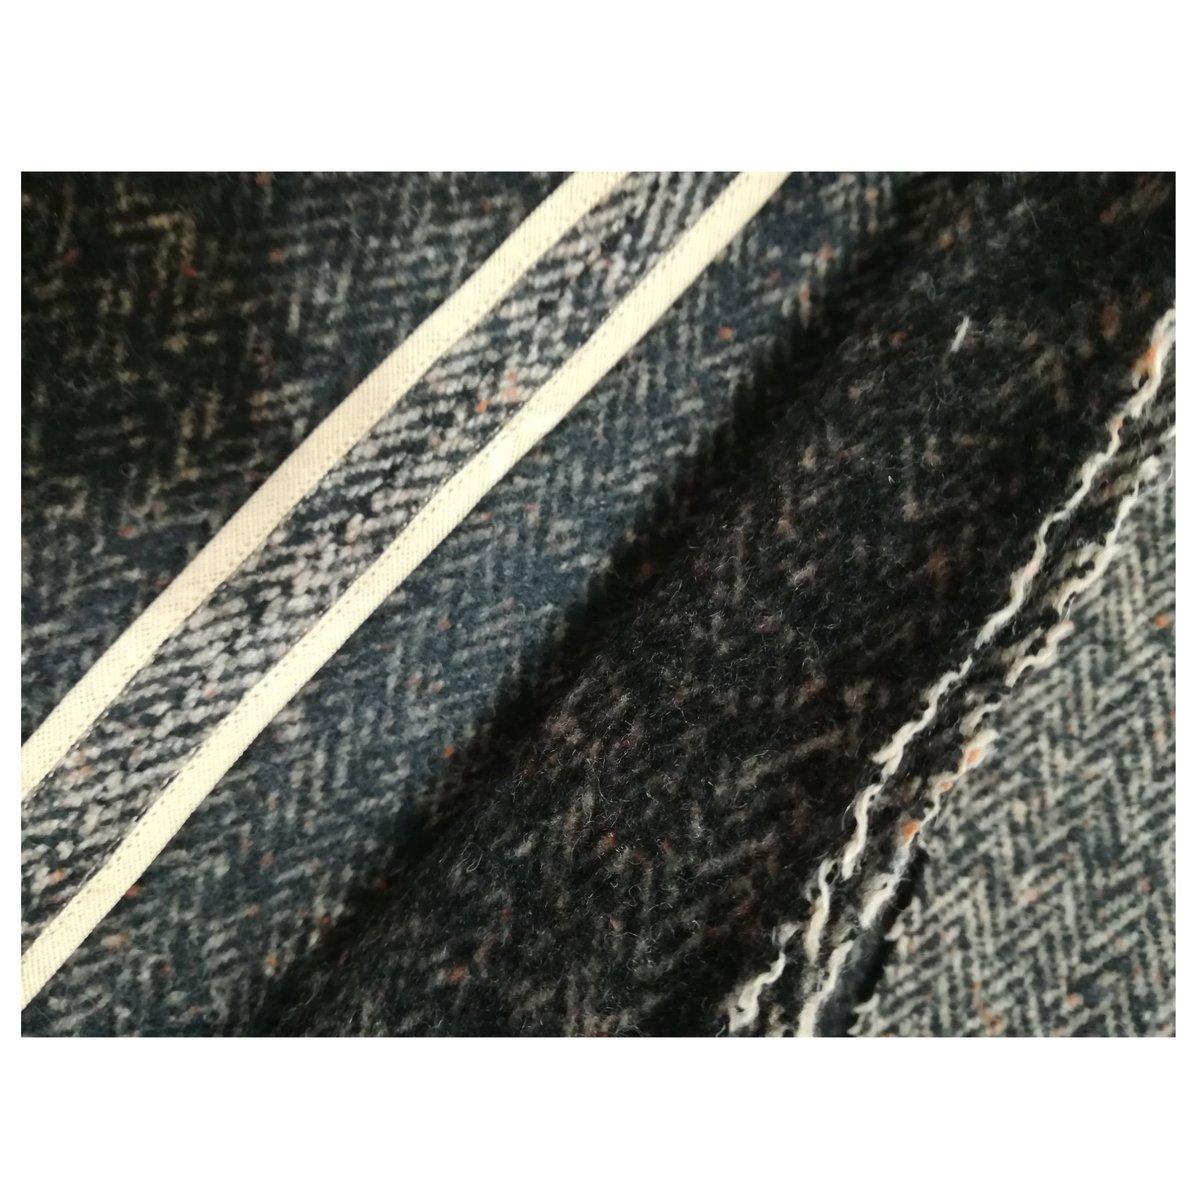 Coats in progress...   #LaraKlawikowski #fashion #design #capetown #local #designer #creative #womenswear #wearableart #texture #tactile #detail #unusual #bespoke #slowfashion #sustainablefashion #innovative #textiles #contemporary #tailoringpic.twitter.com/CW9fVAEKzd